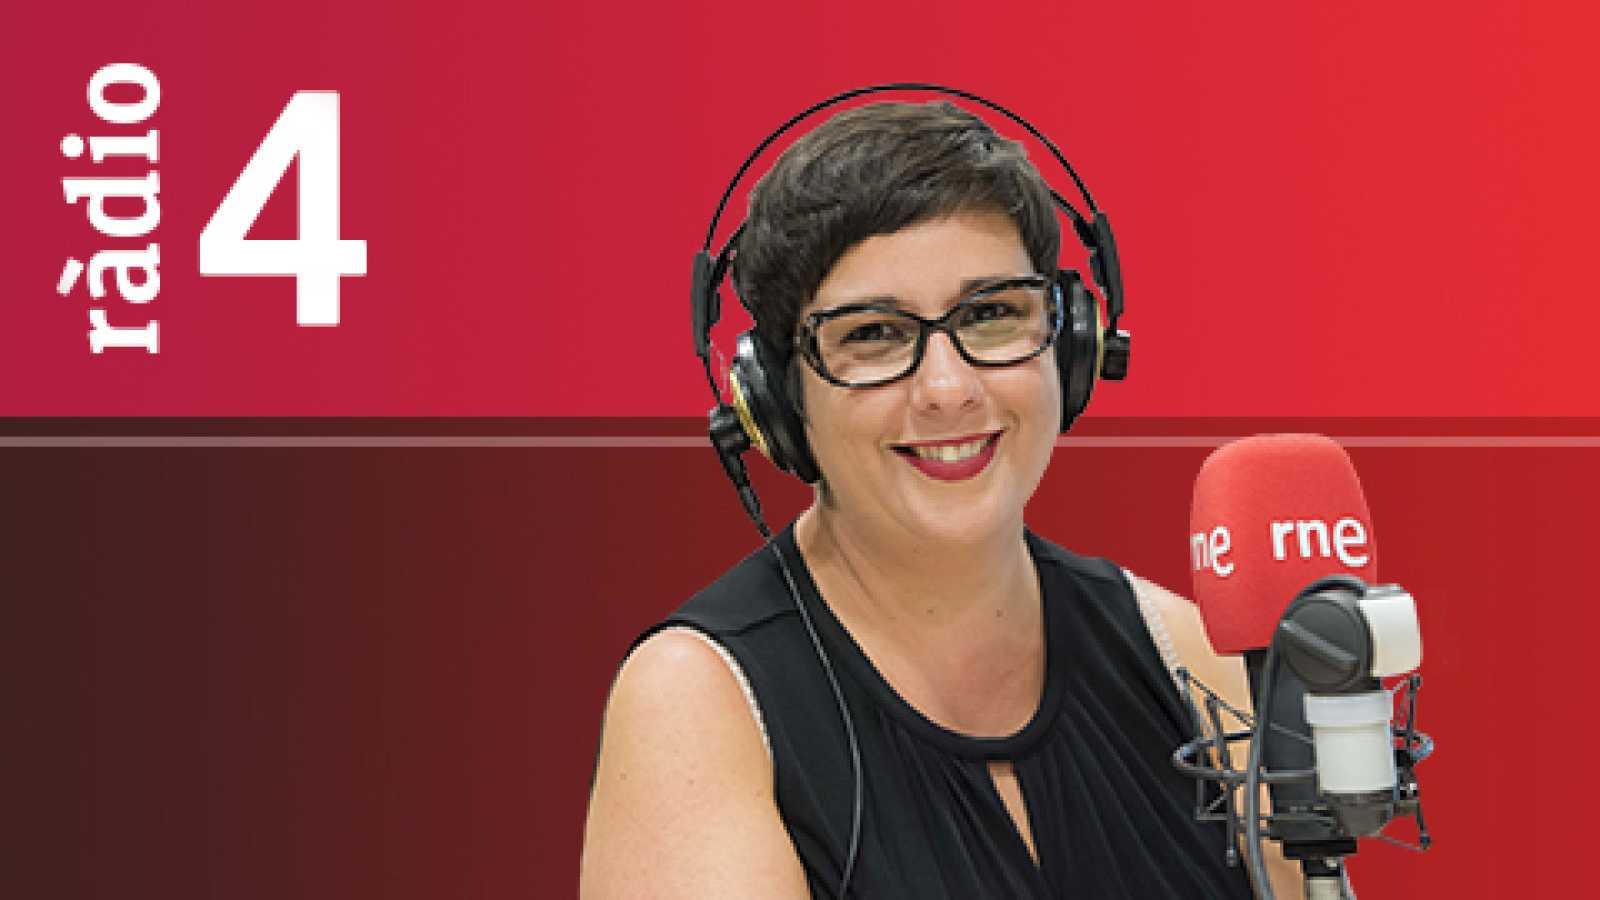 Realpolitik - Nil López, Josep Maria Tirapu, Alvaro Clapés-Saganyoles, Pau Ferran